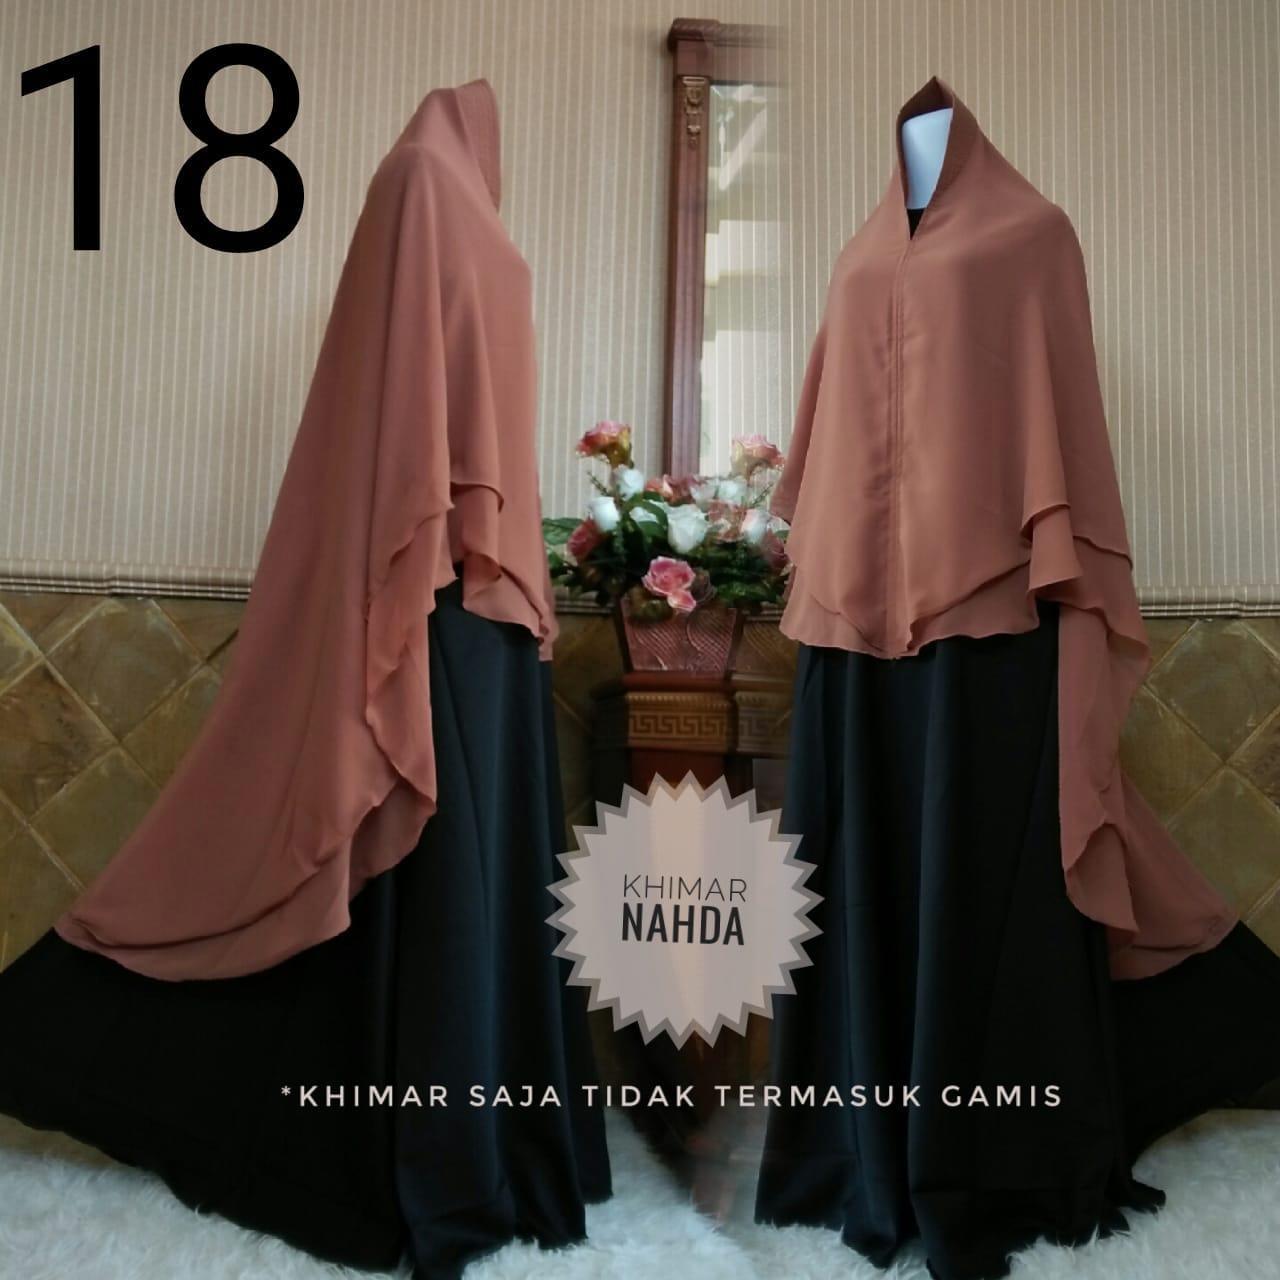 Lonicsgamis Khimar syari nahda jilbab ceruty kgimar 2layer hijab murah